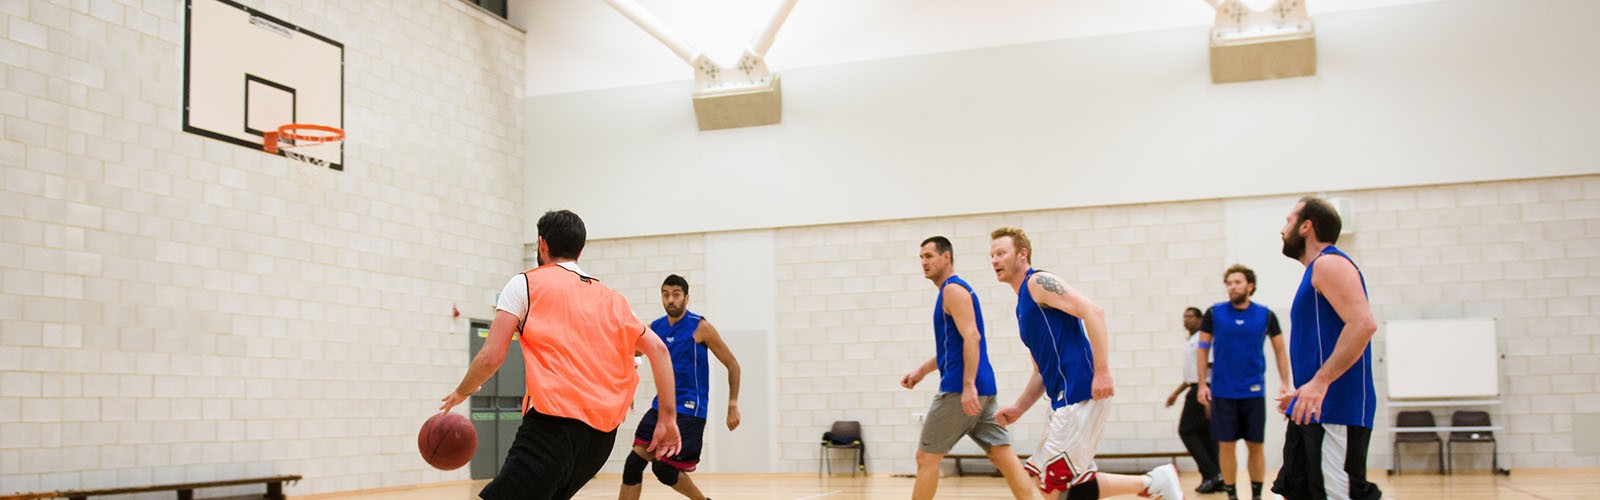 _0038_GOMammoth-Basketball-London